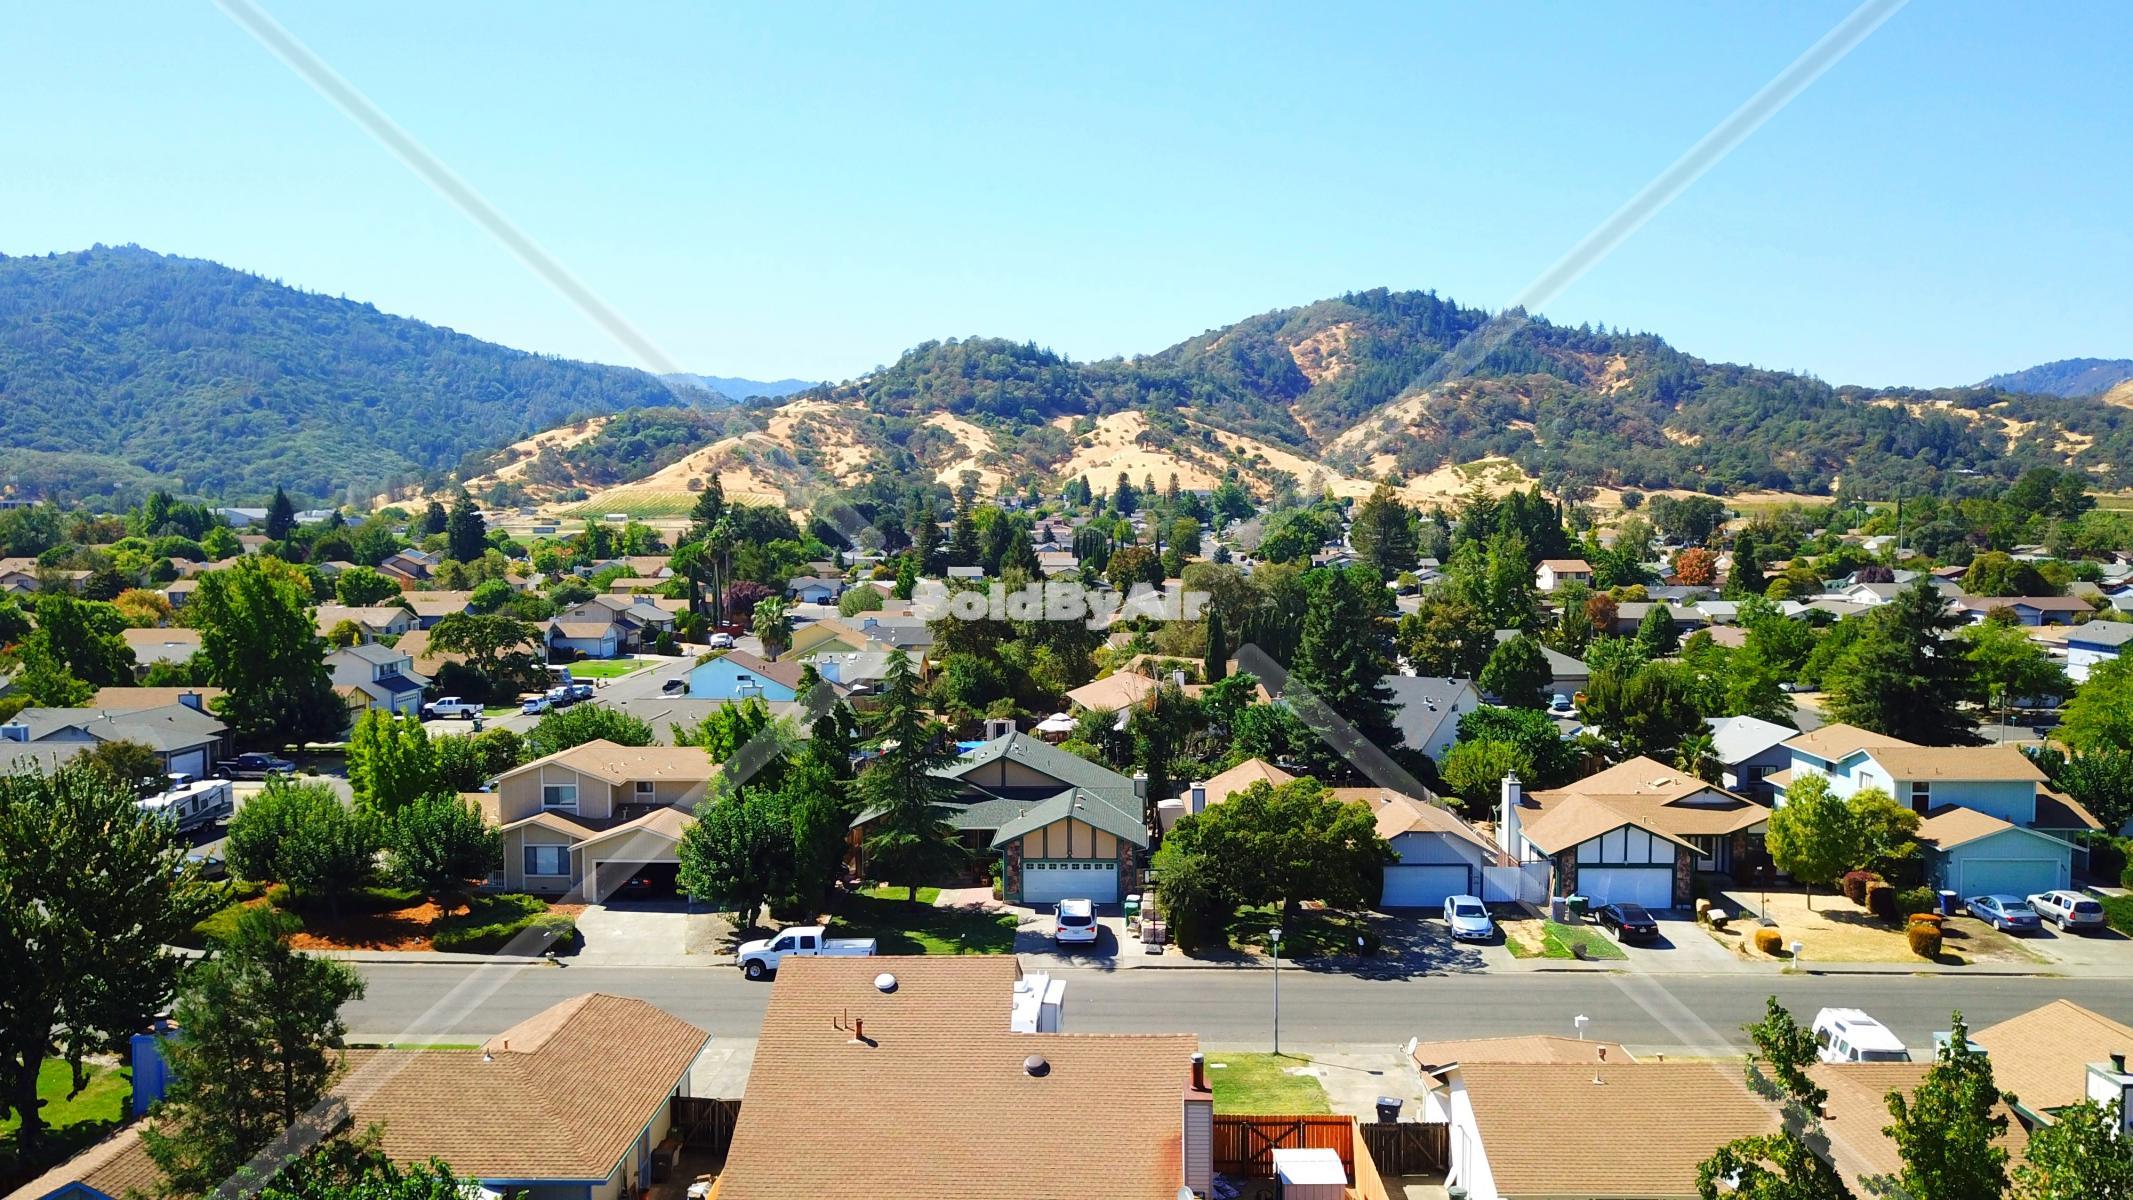 Drone Photo of Near Ukiah High School in Ukiah California